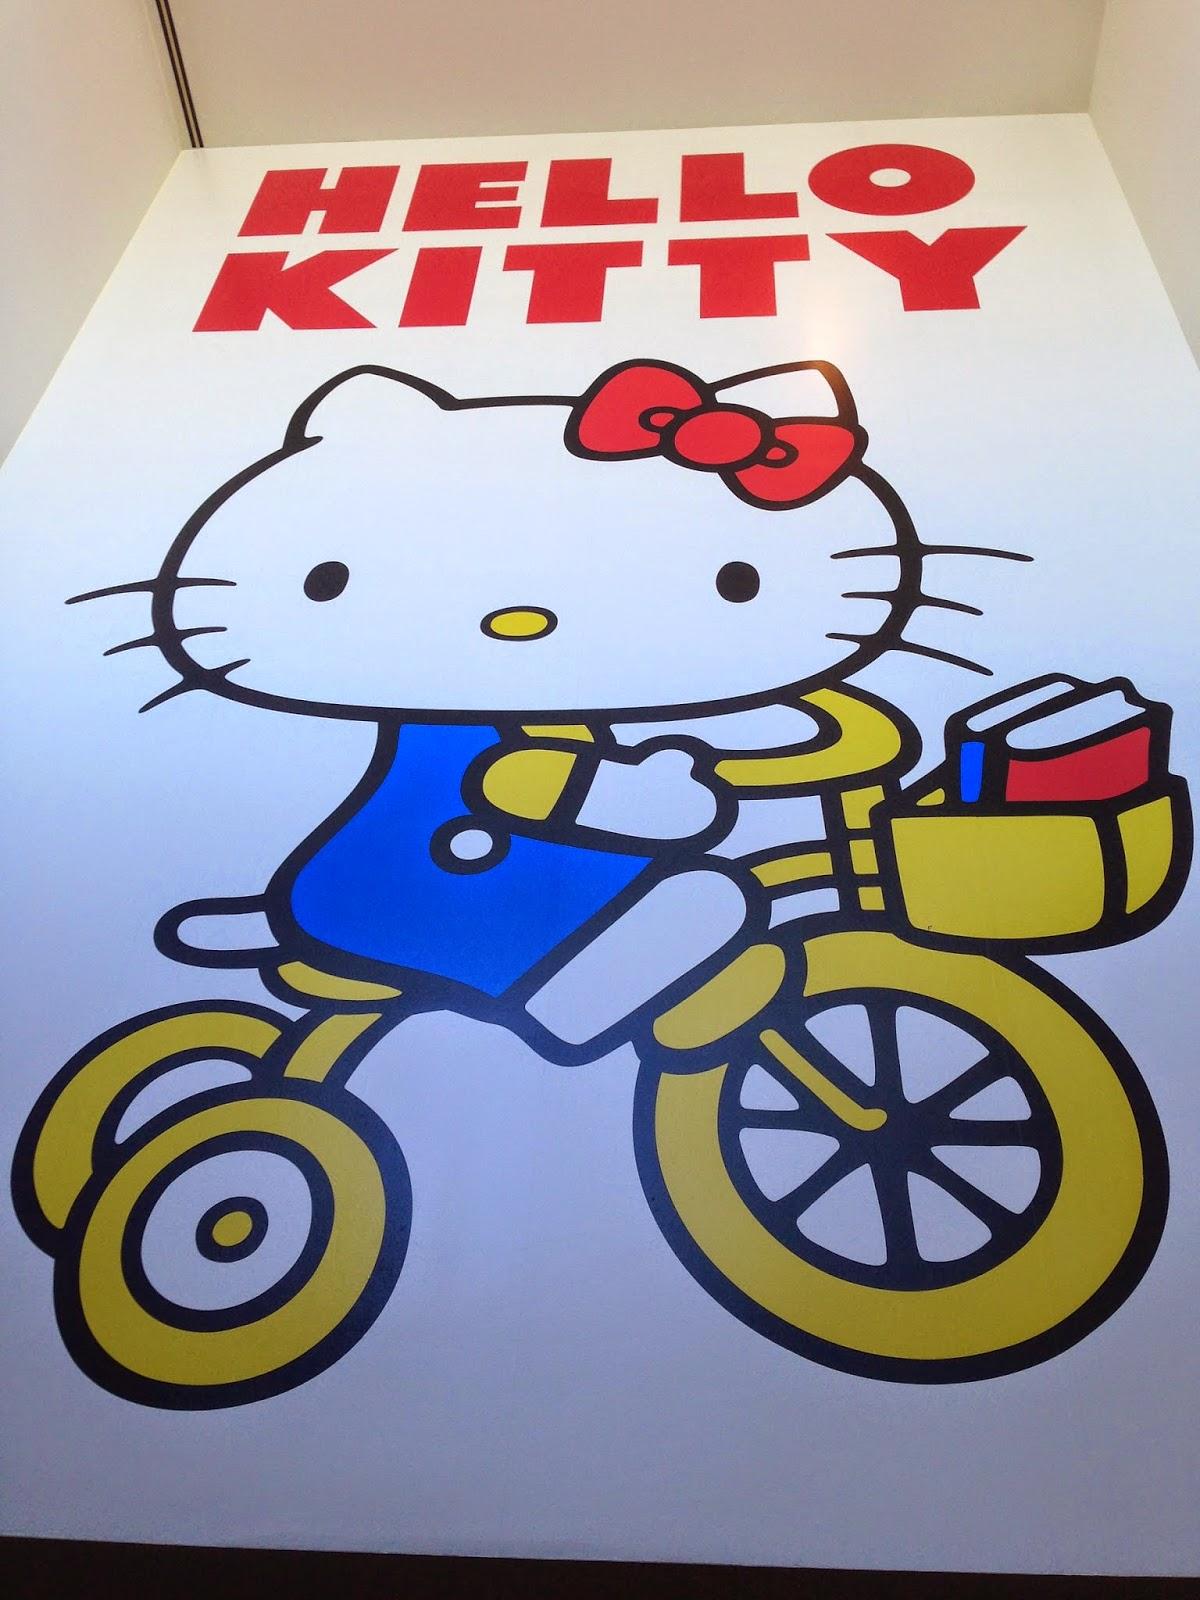 Violently Happy La Cake Club Amp Hello Kitty Exhibit At The